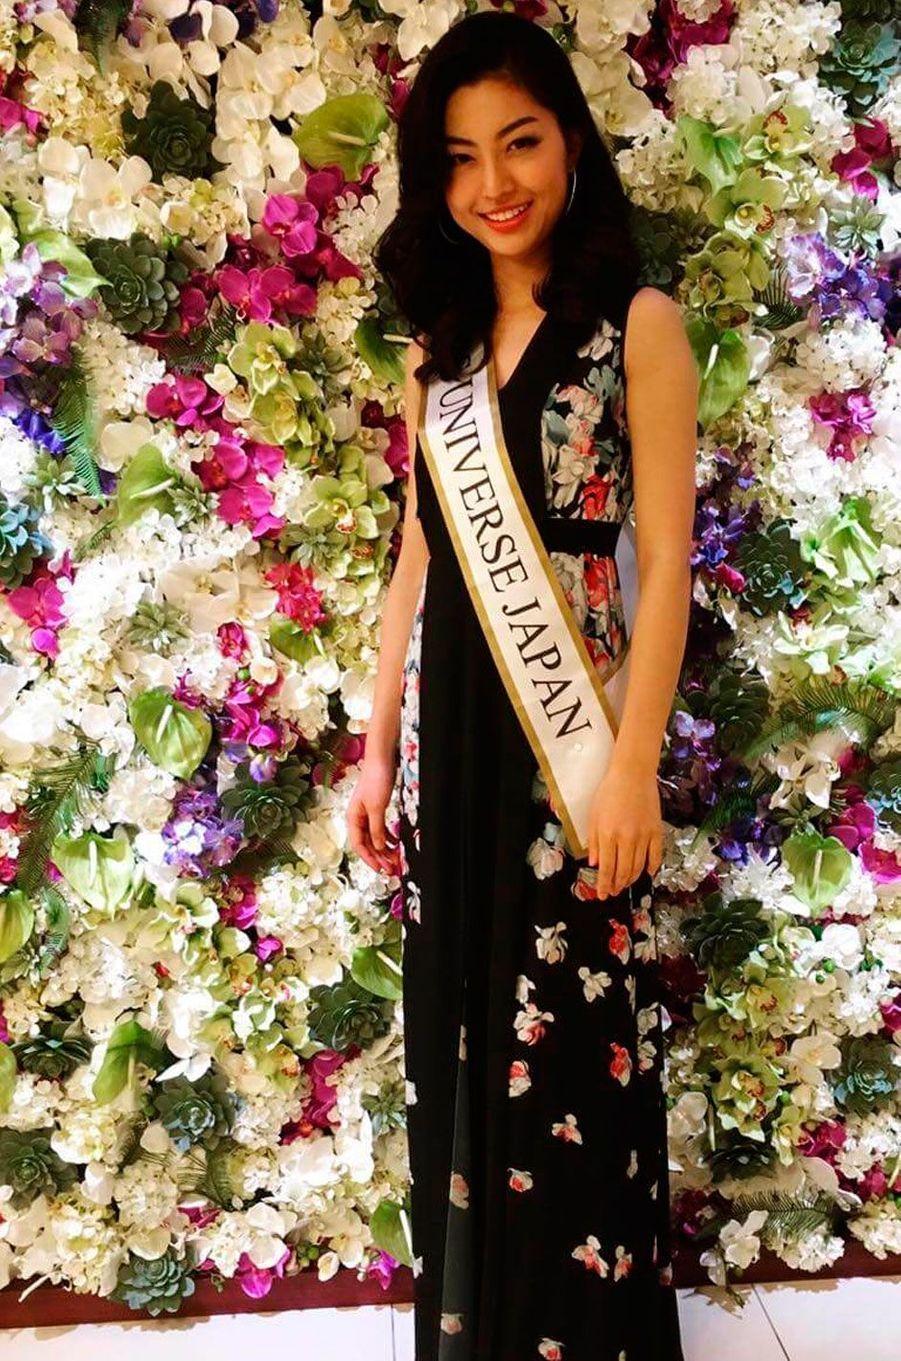 Miss Japon, Sari Nakazawa